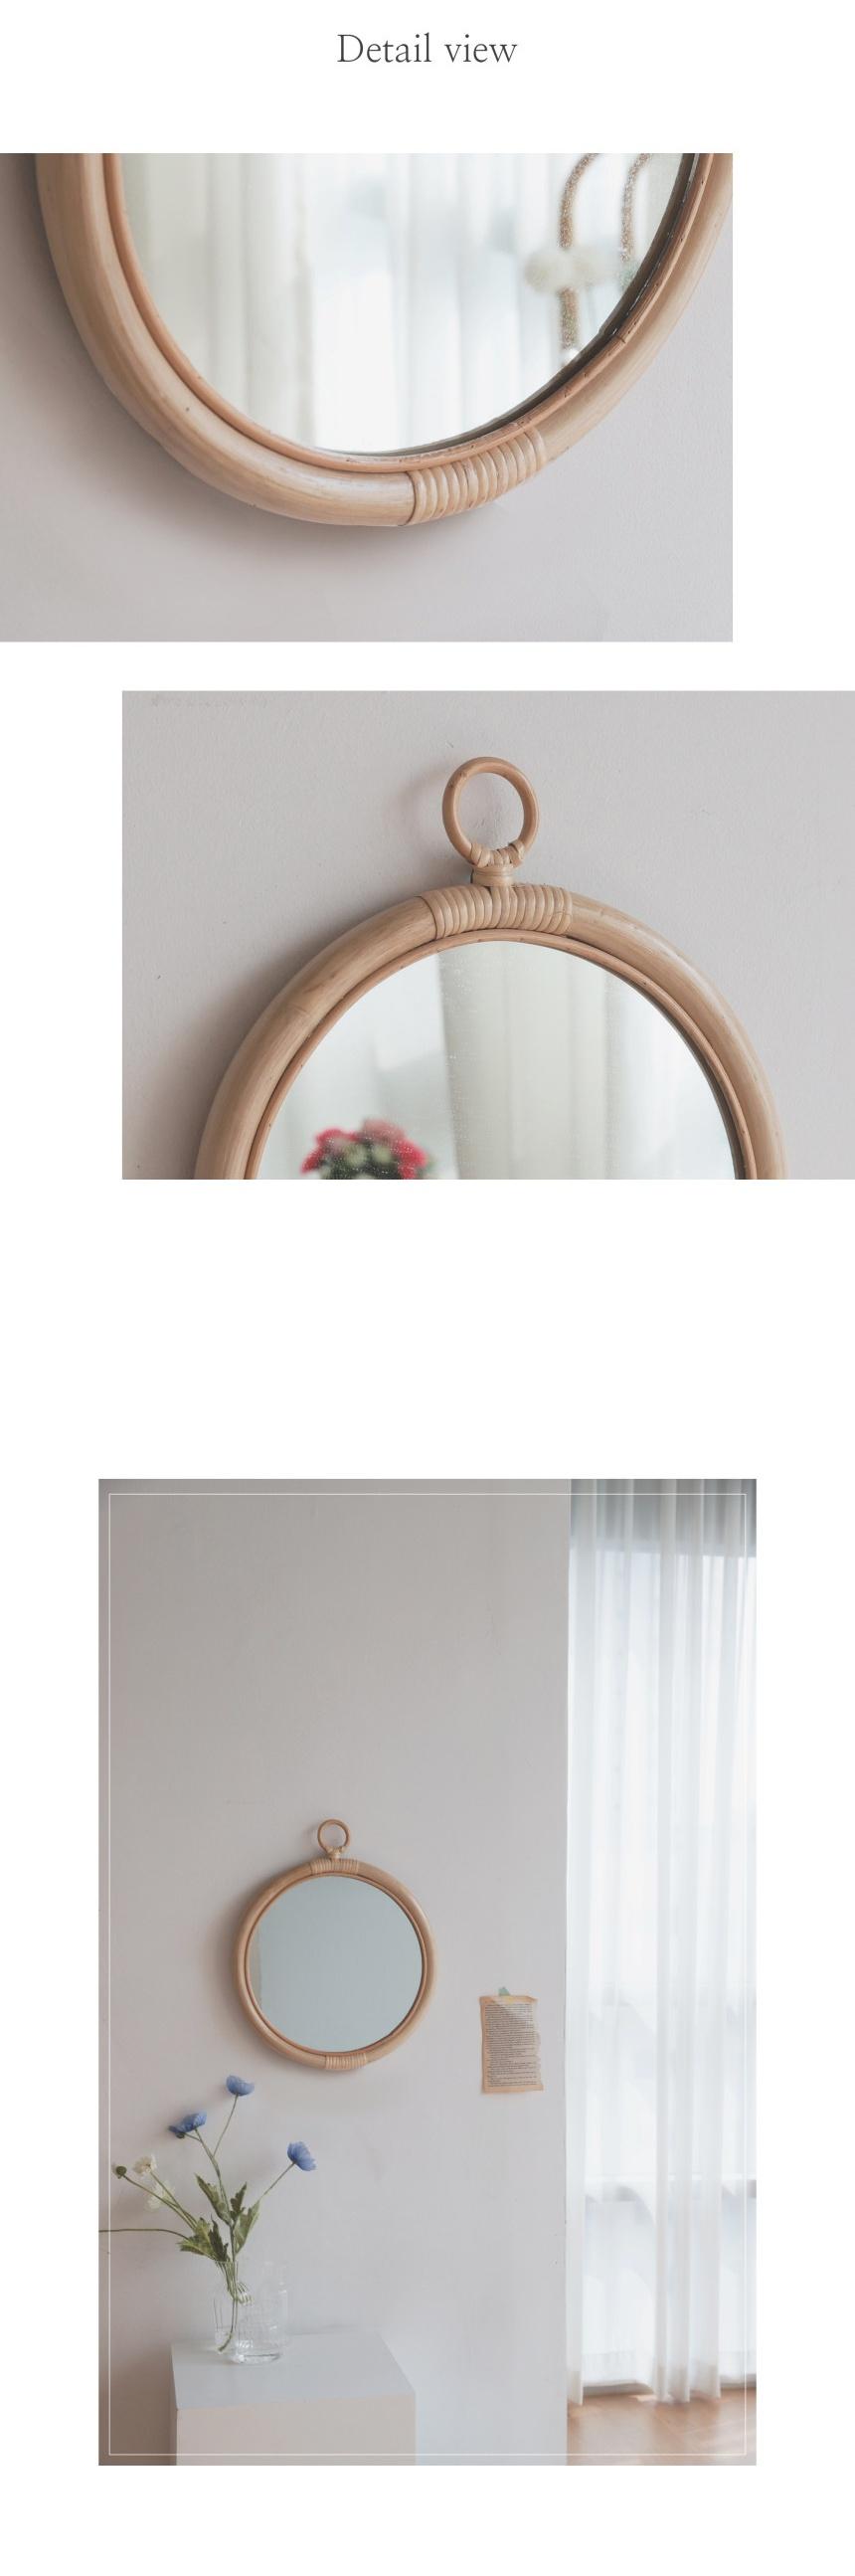 lattan_frame_mirror_04.jpg